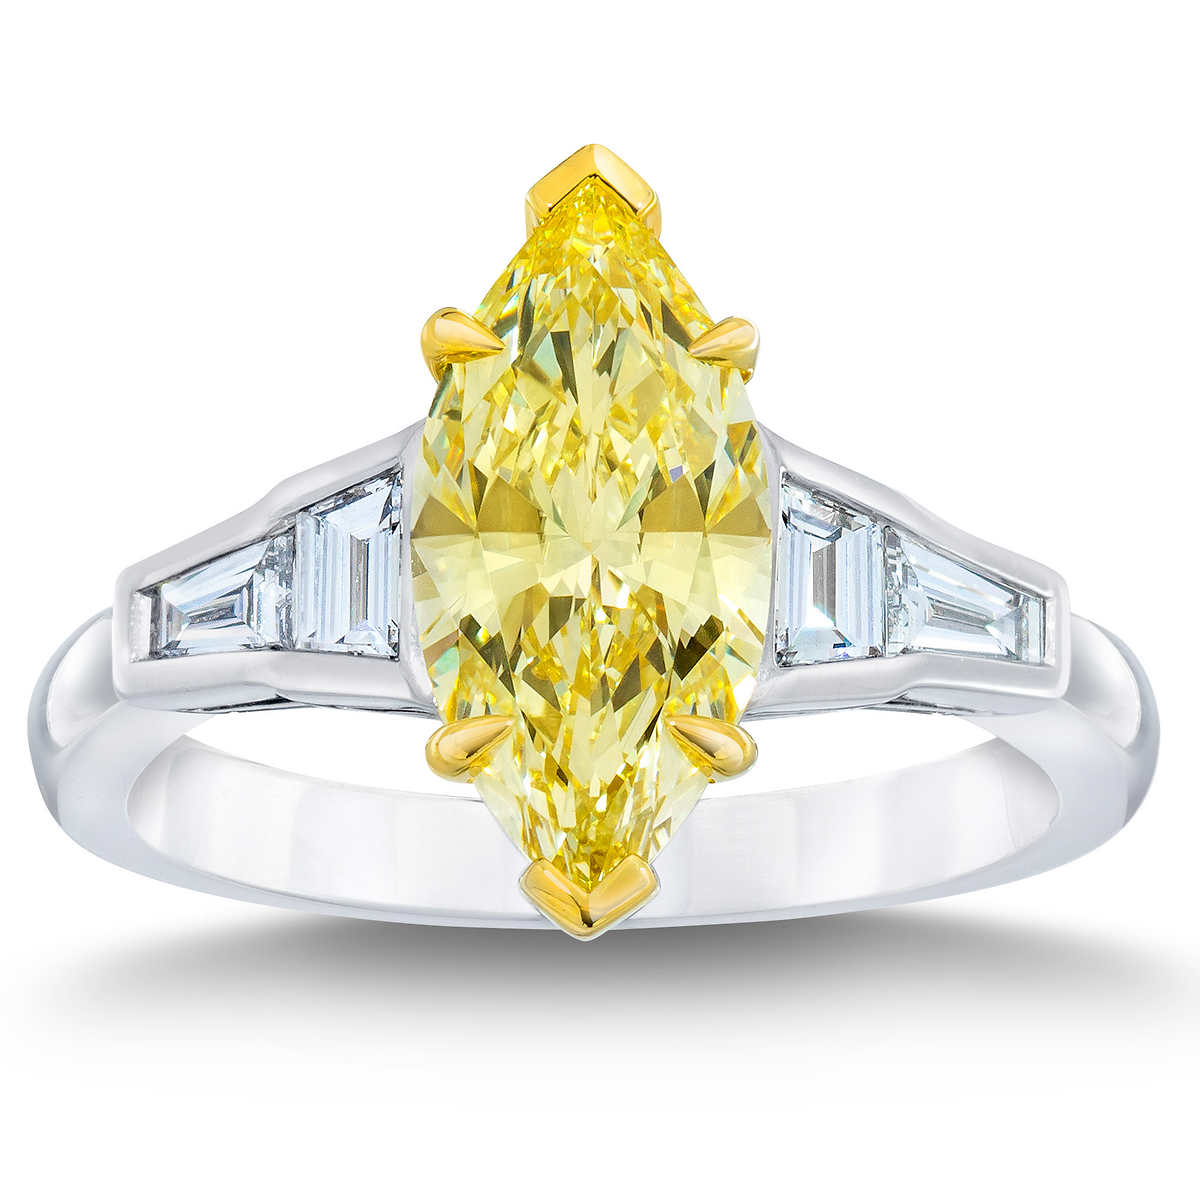 Marquise Cut 254 Ctw Vs1 Clarity, Fancy Yellow Diamond Platinum Ring